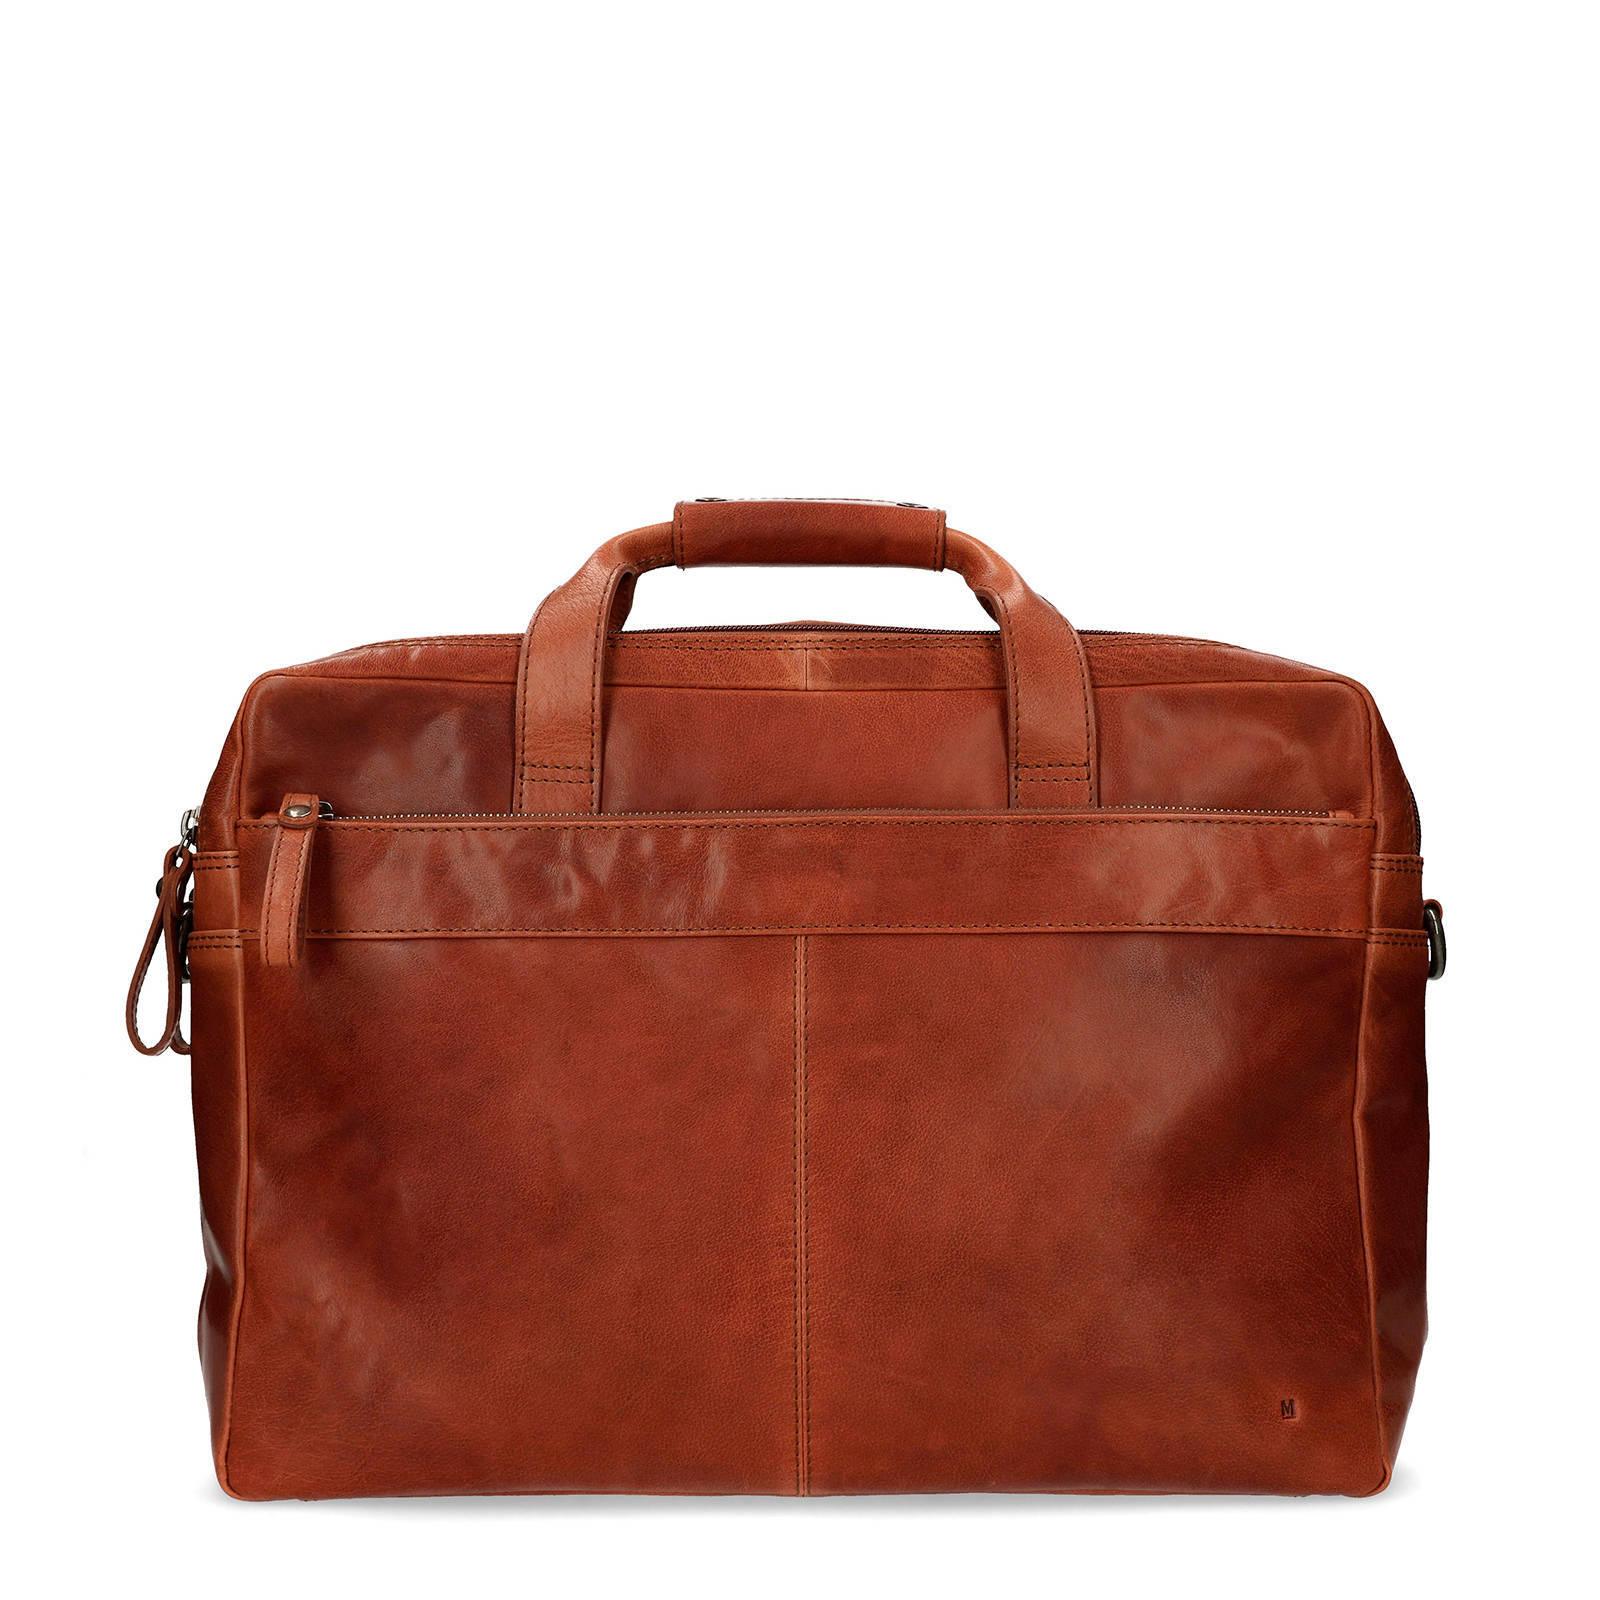 561b4cfcade Manfield leren laptoptas cognac | wehkamp